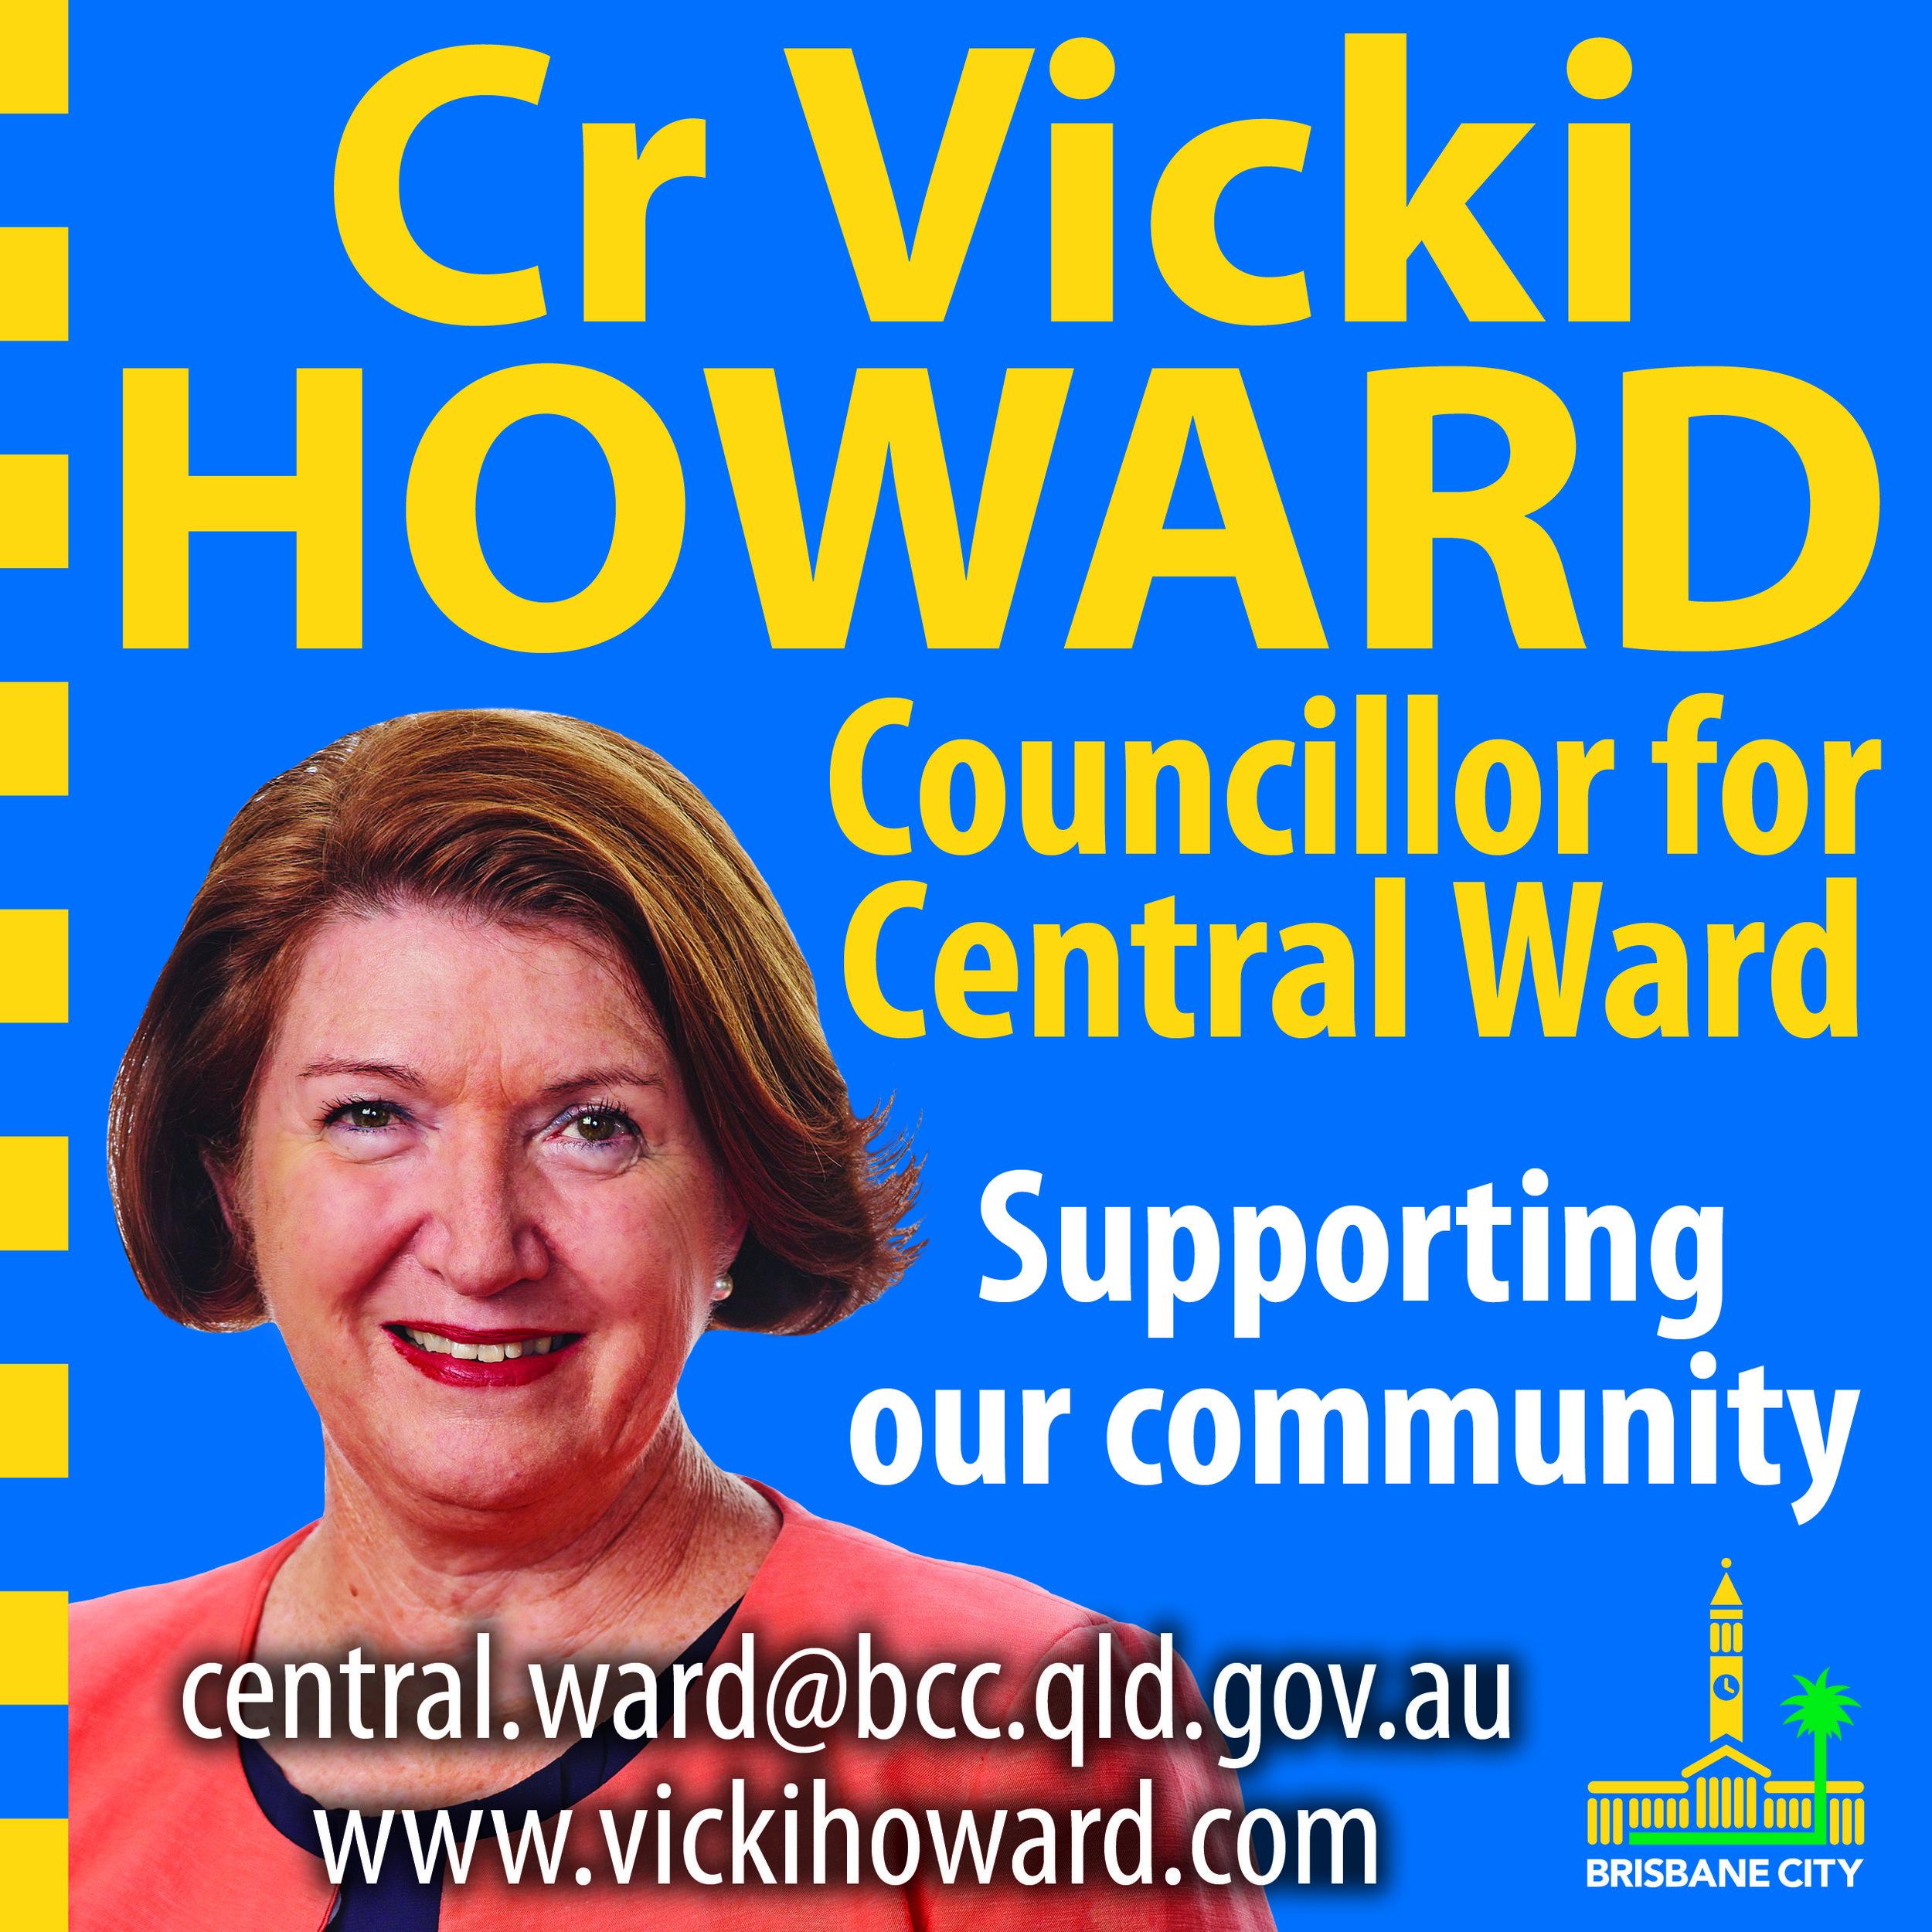 Cr Vicki Howard